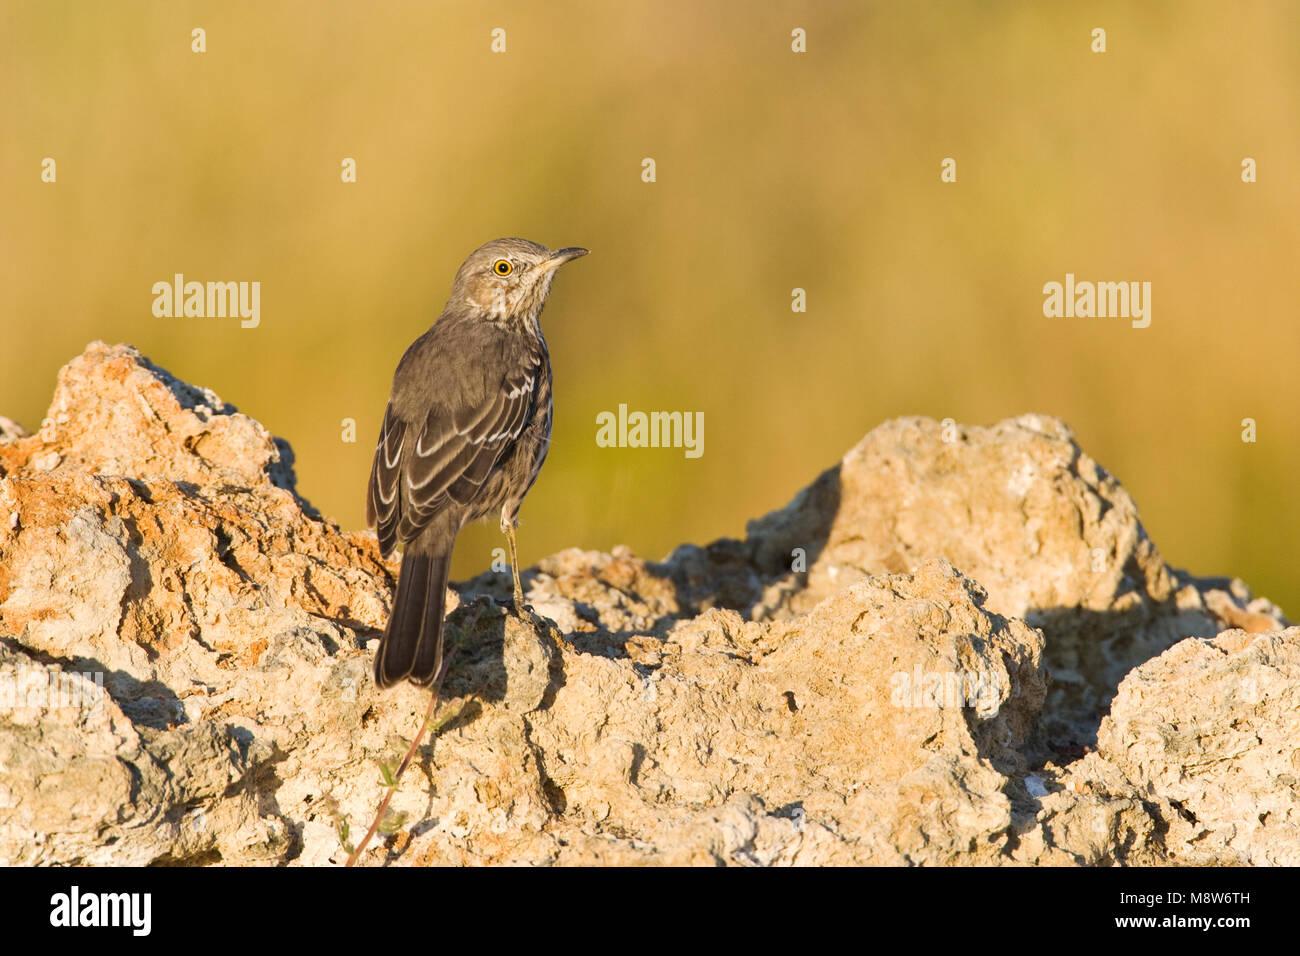 Bergspotlijster; Sage Thrasher - Stock Image